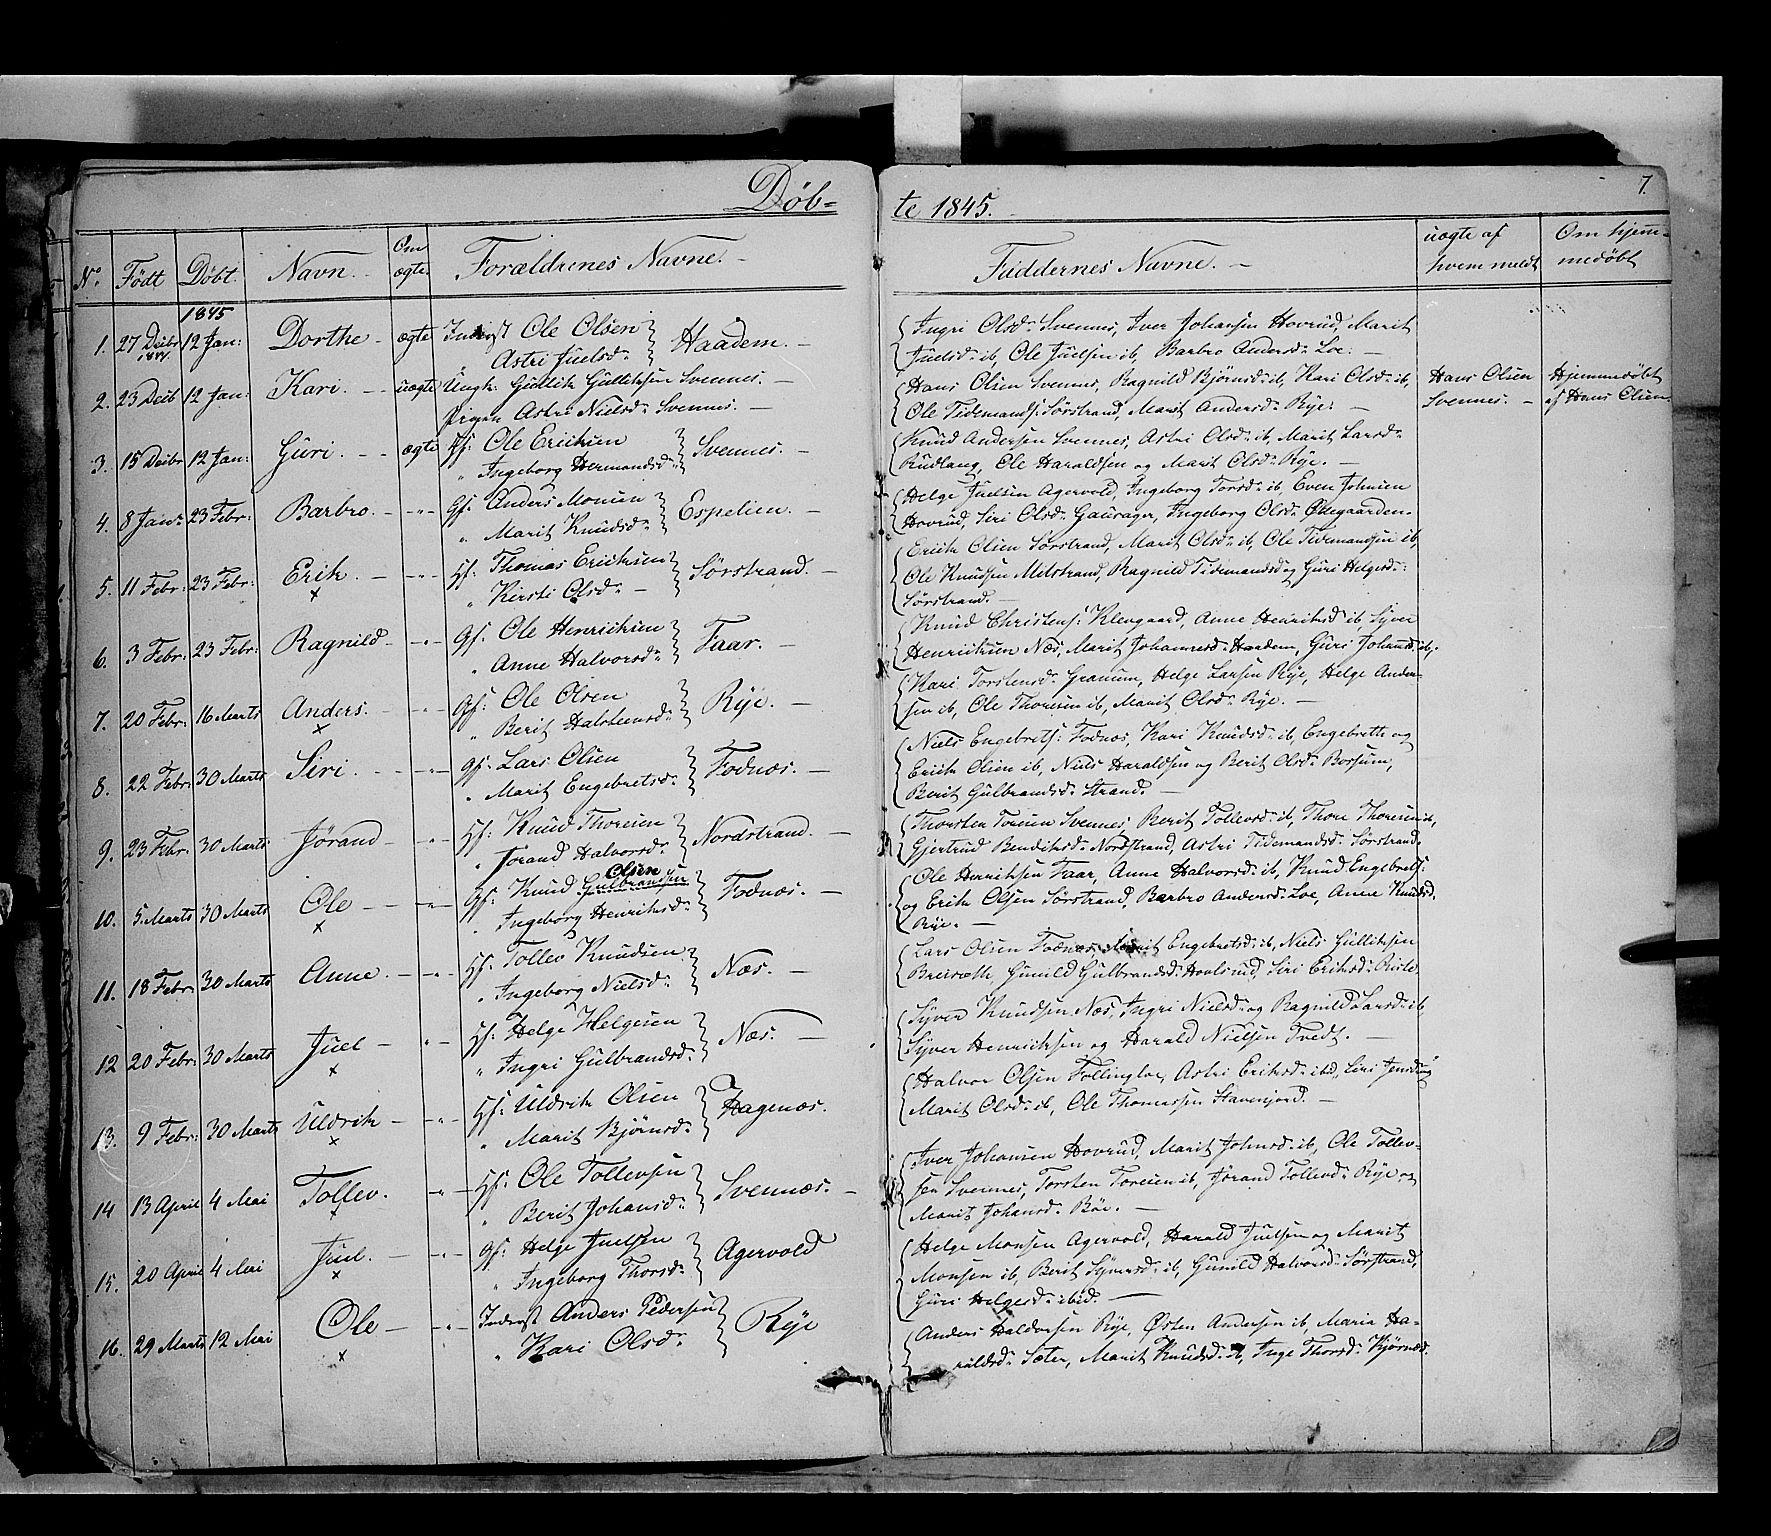 SAH, Nord-Aurdal prestekontor, Ministerialbok nr. 5, 1842-1863, s. 7